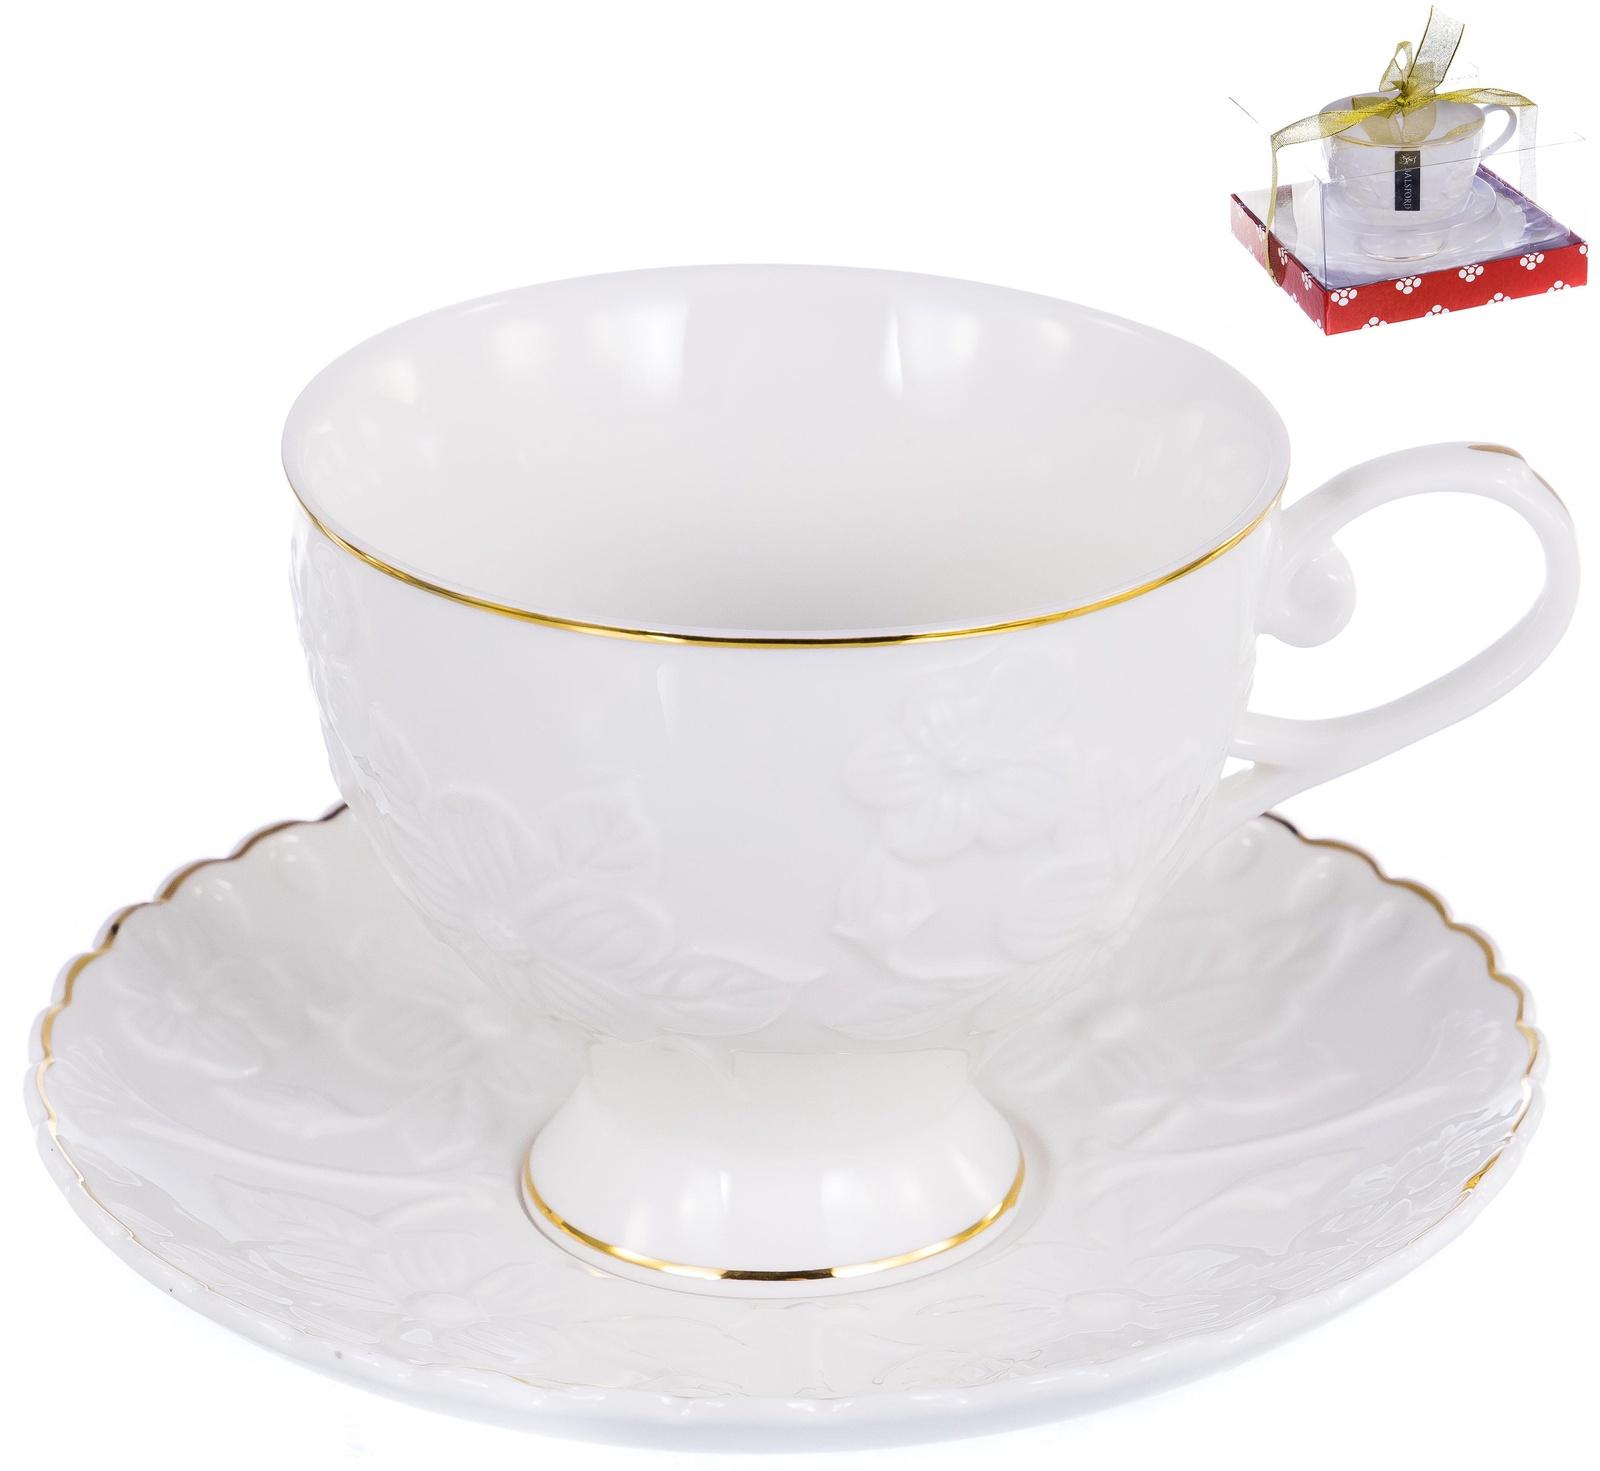 Набор чайный ГРАЦИЯ серия ГАЛИЯ , подарочная упаковка PVC, ТМ Balsford, артикул 101-30040